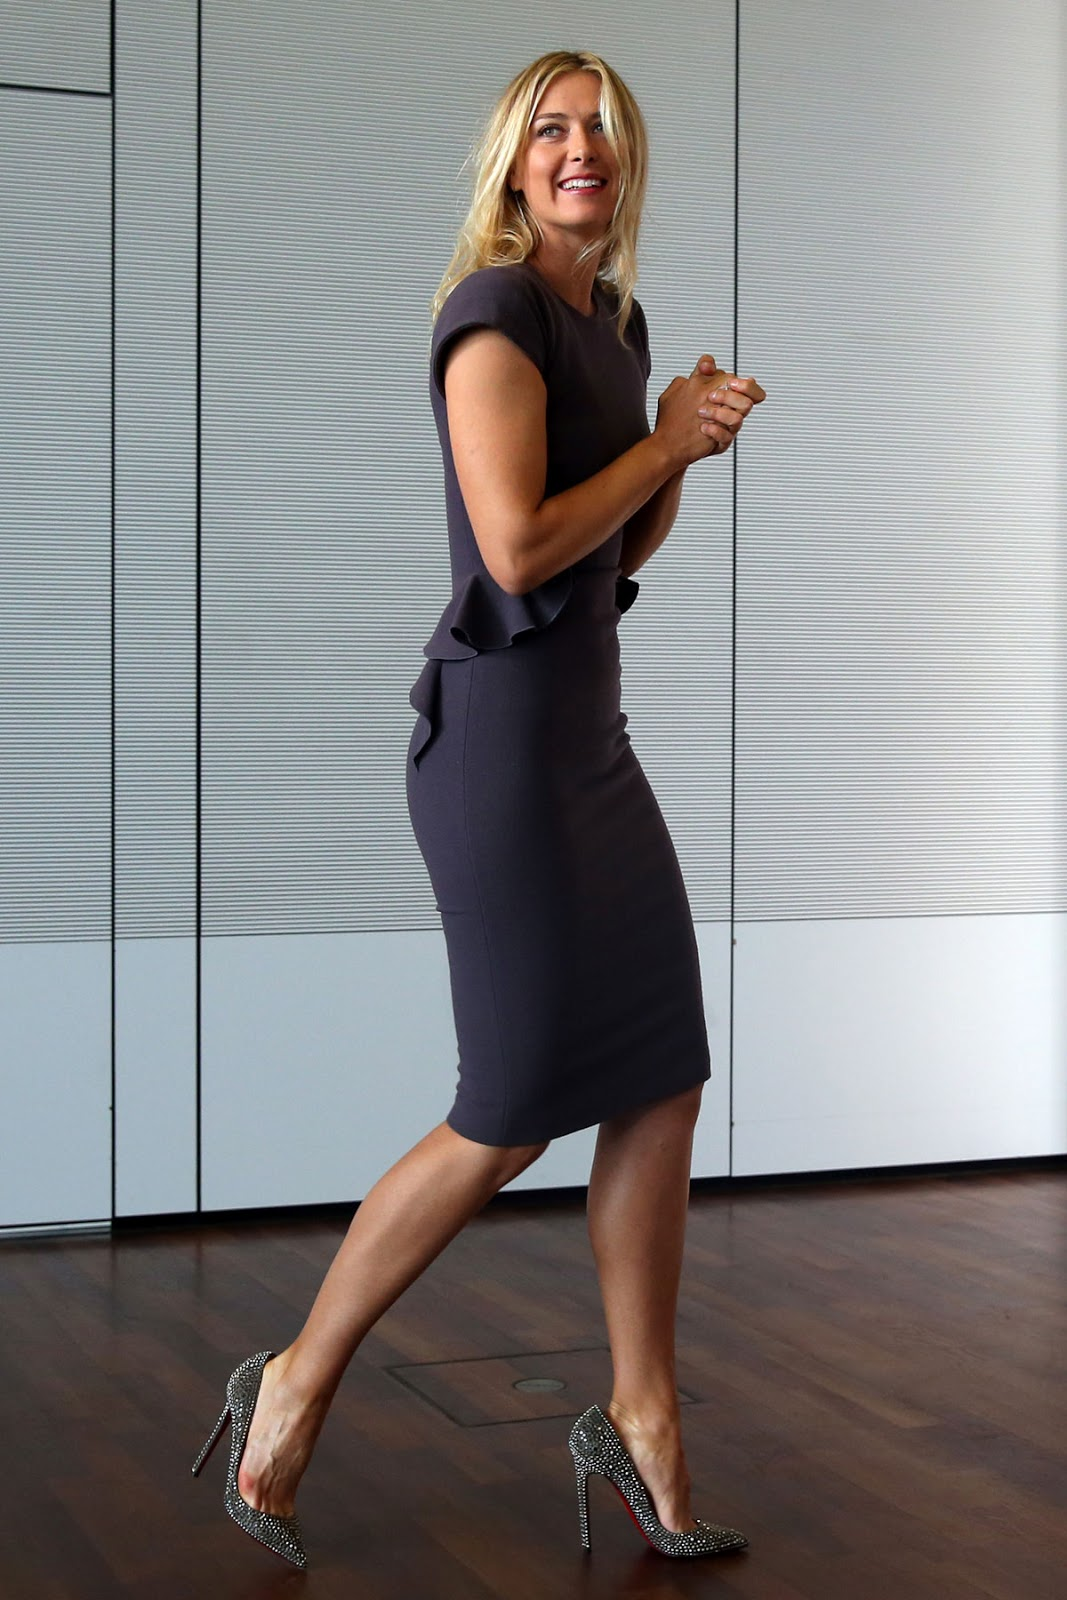 Maria+Sharapova+Unveiled+as+Porsche's+New+Brand+Ambassador+in+Stuttgart+Photos+CelebsNext+0012 Maria Sharapova  Fashion Style